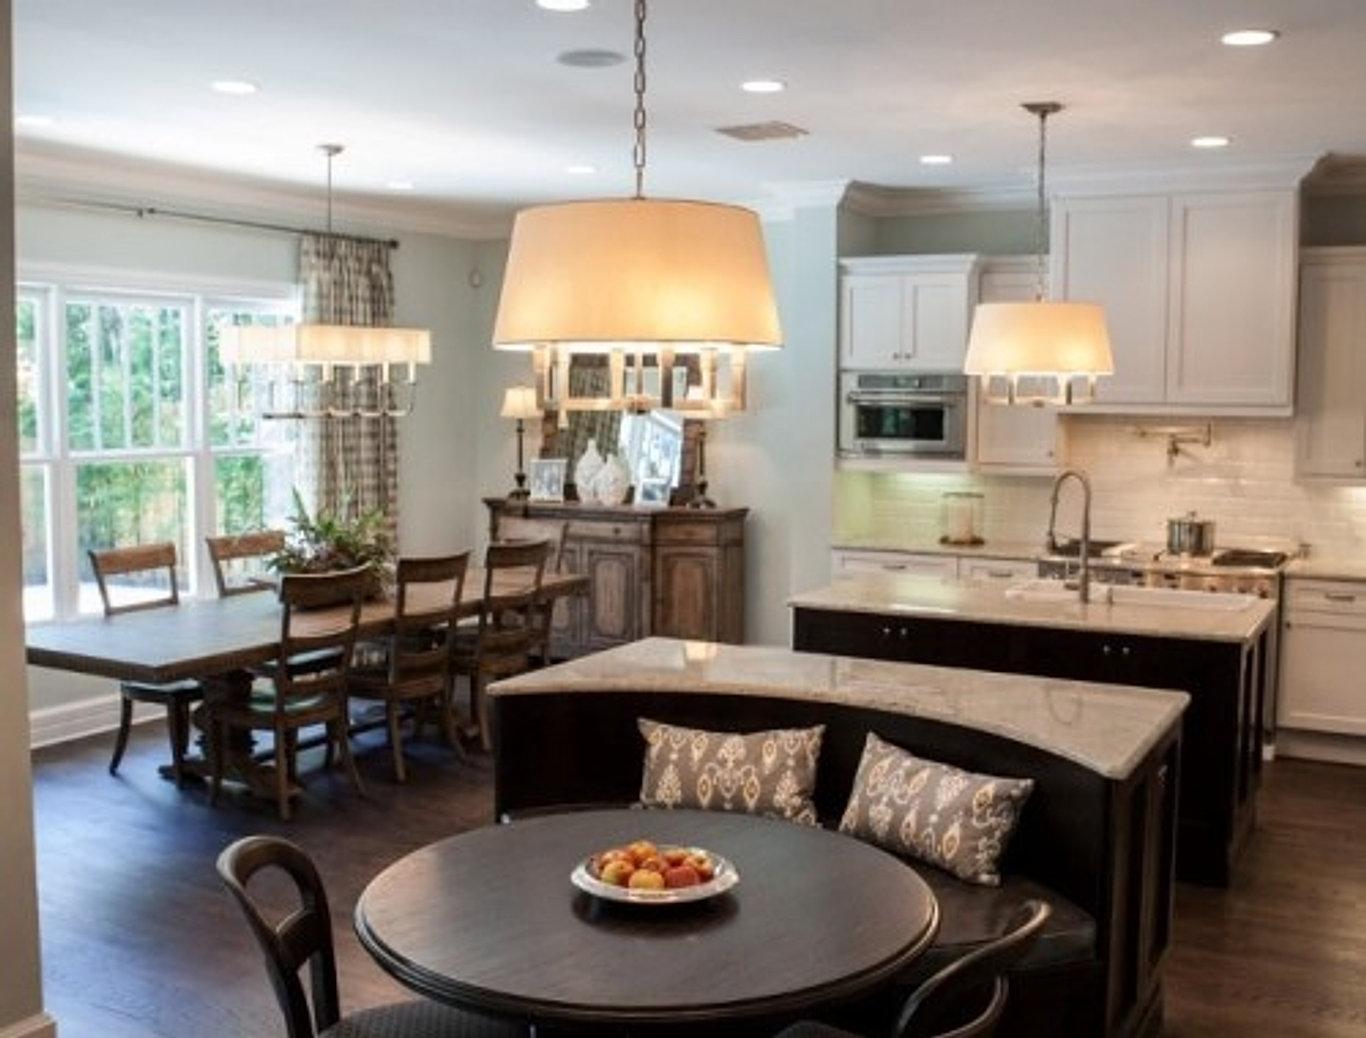 Elegant Our Tampa Interior Design Firm Serves Nationwide Including Prime  Florida Addresses Such As Palm Beach Boca Raton Naples And Miami With  Interior ...